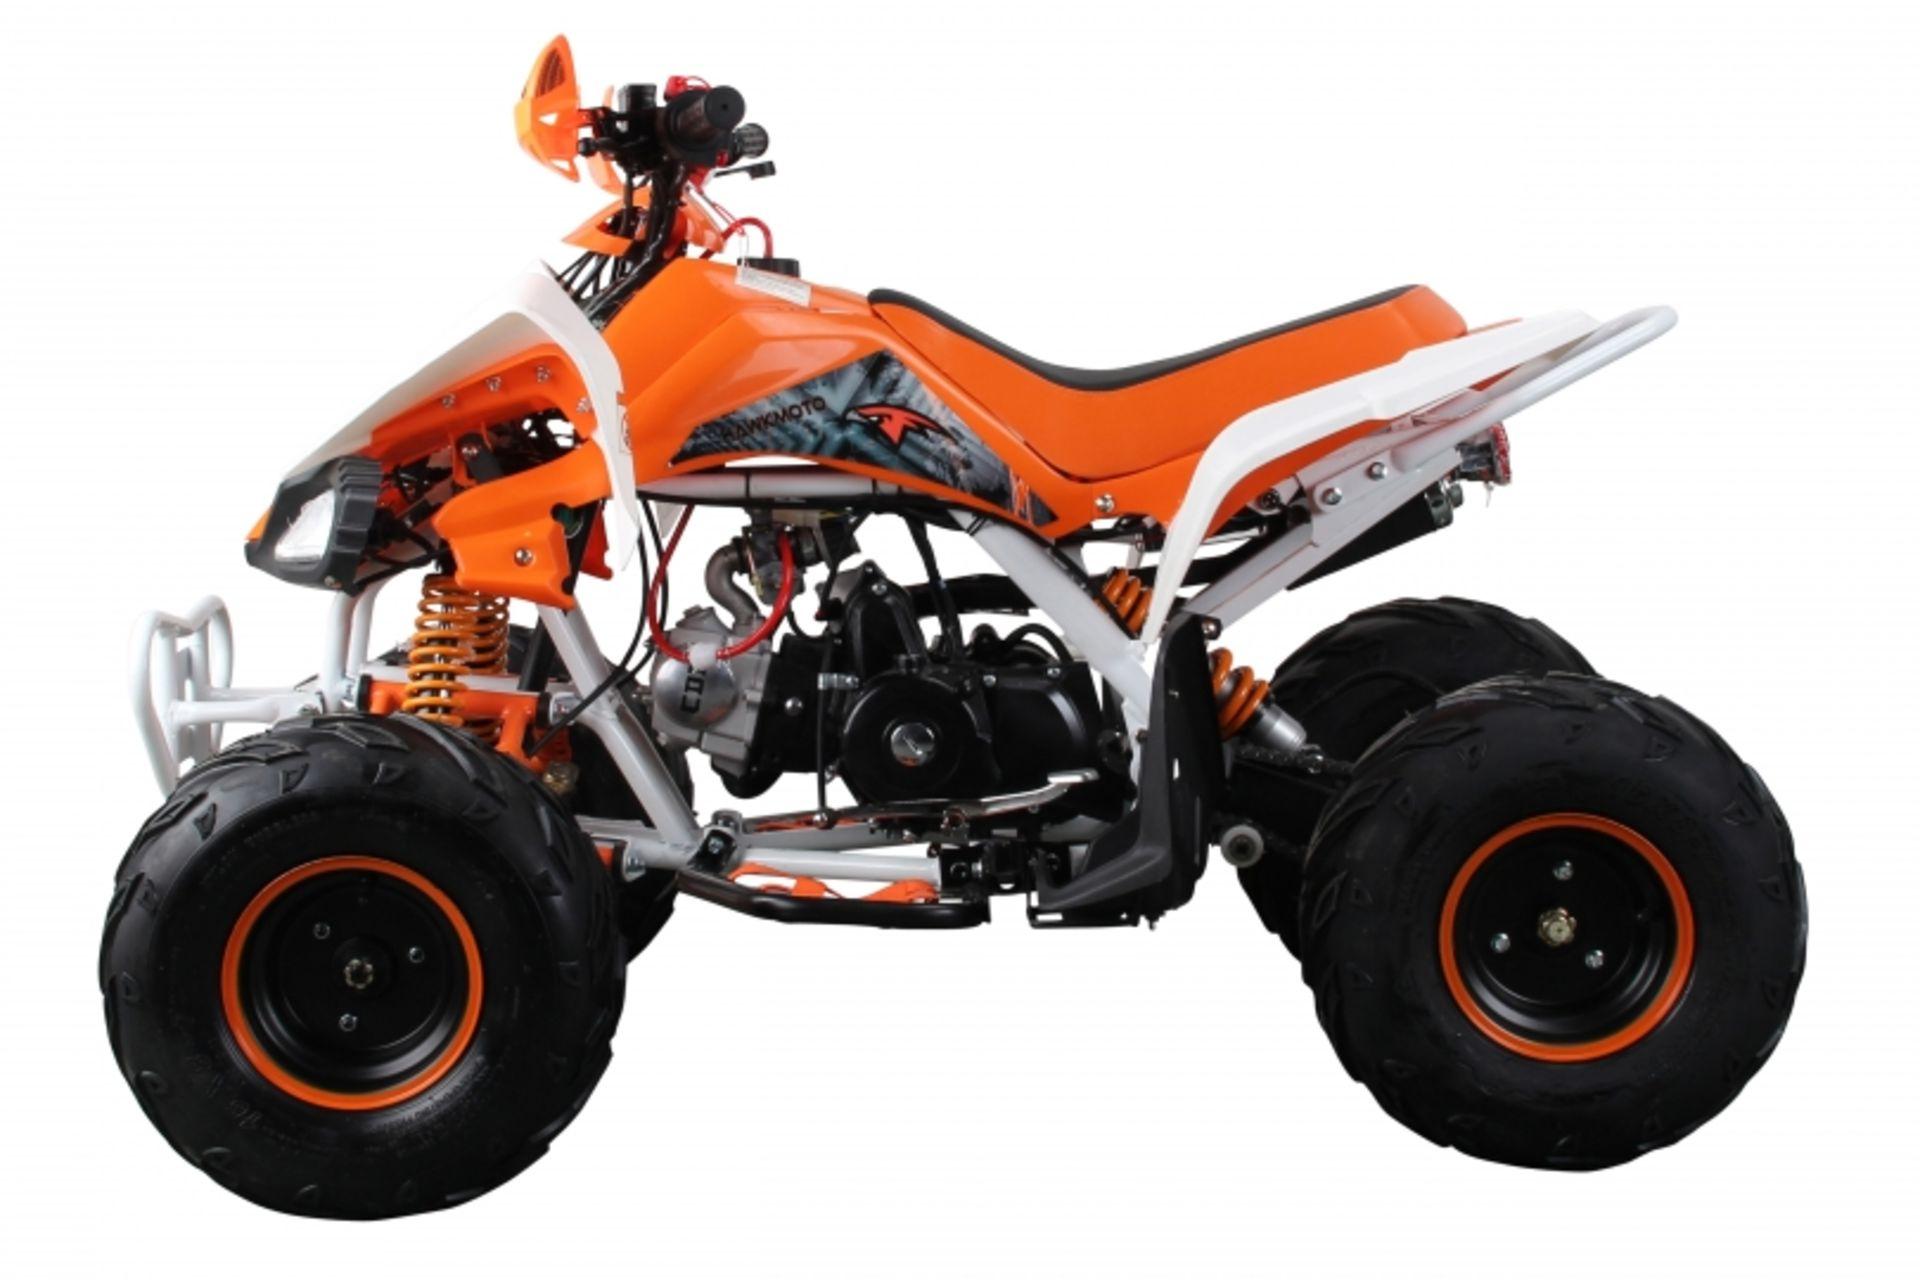 Lot 23532 - V Brand New 125cc Interceptor SV2 4 Stroke Quad Bike With Reverse Gear - Double Front Suspension/